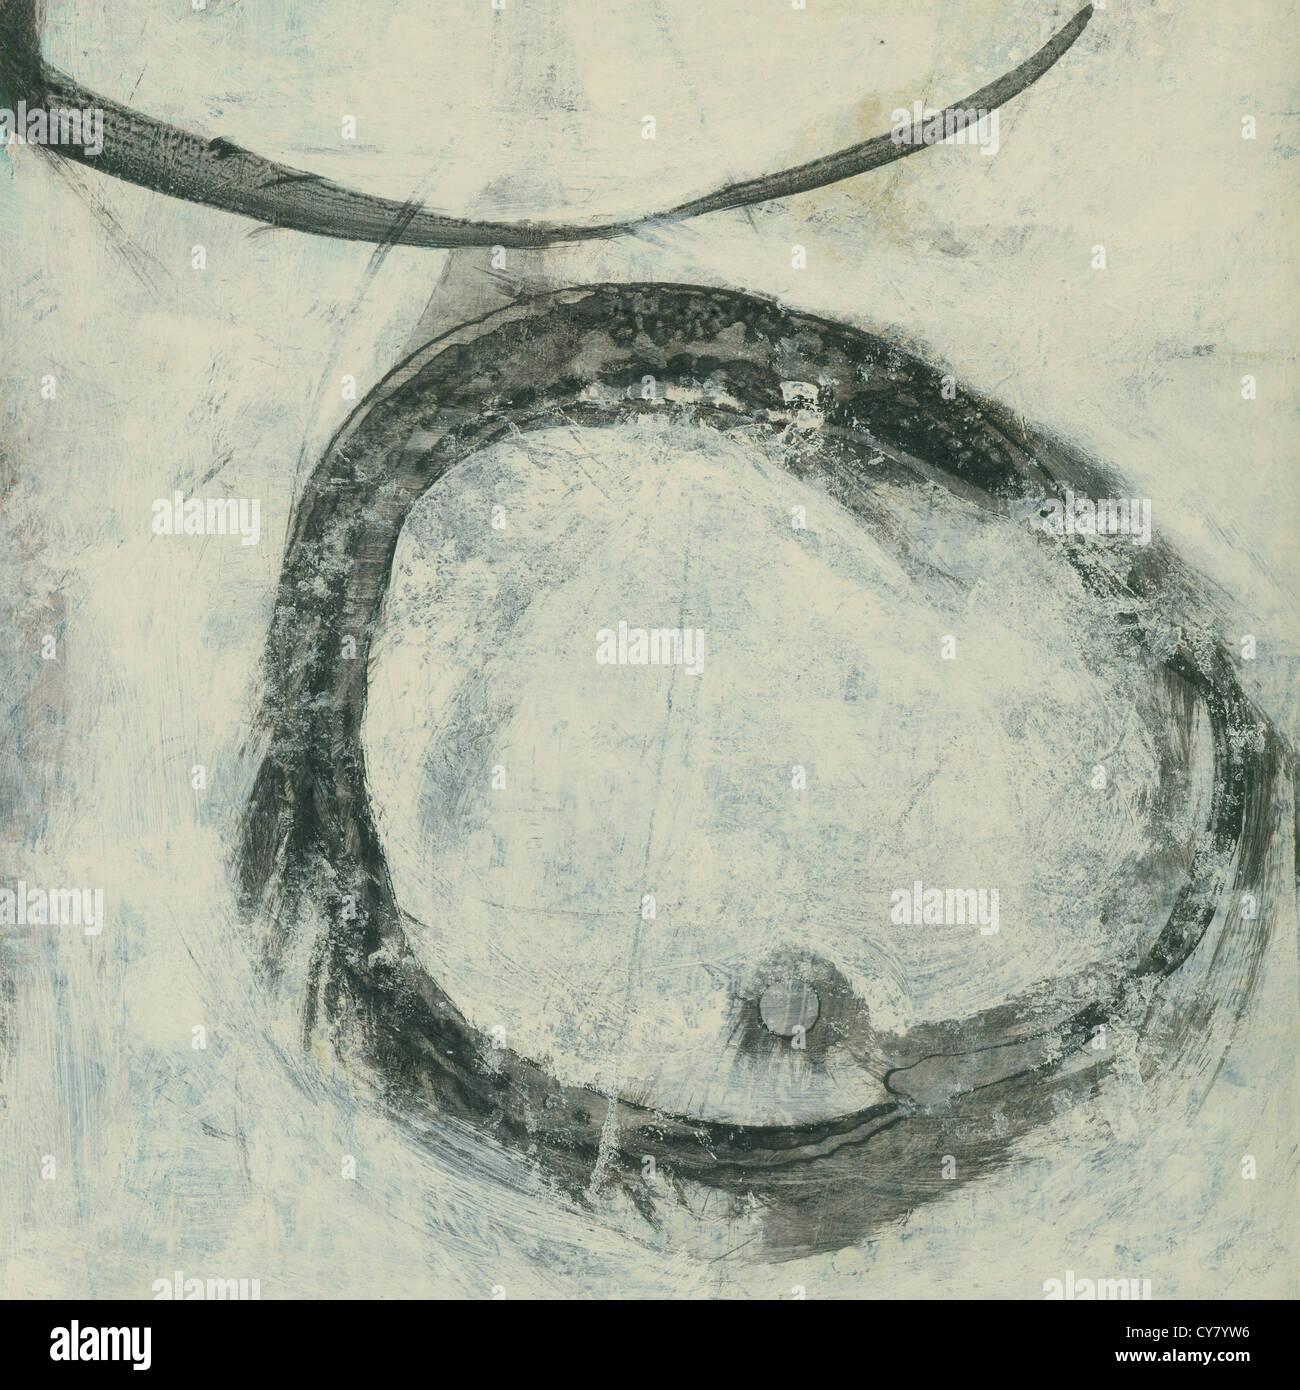 Pintura abstracta círculo zen de tinta negra sobre beige. Imagen De Stock